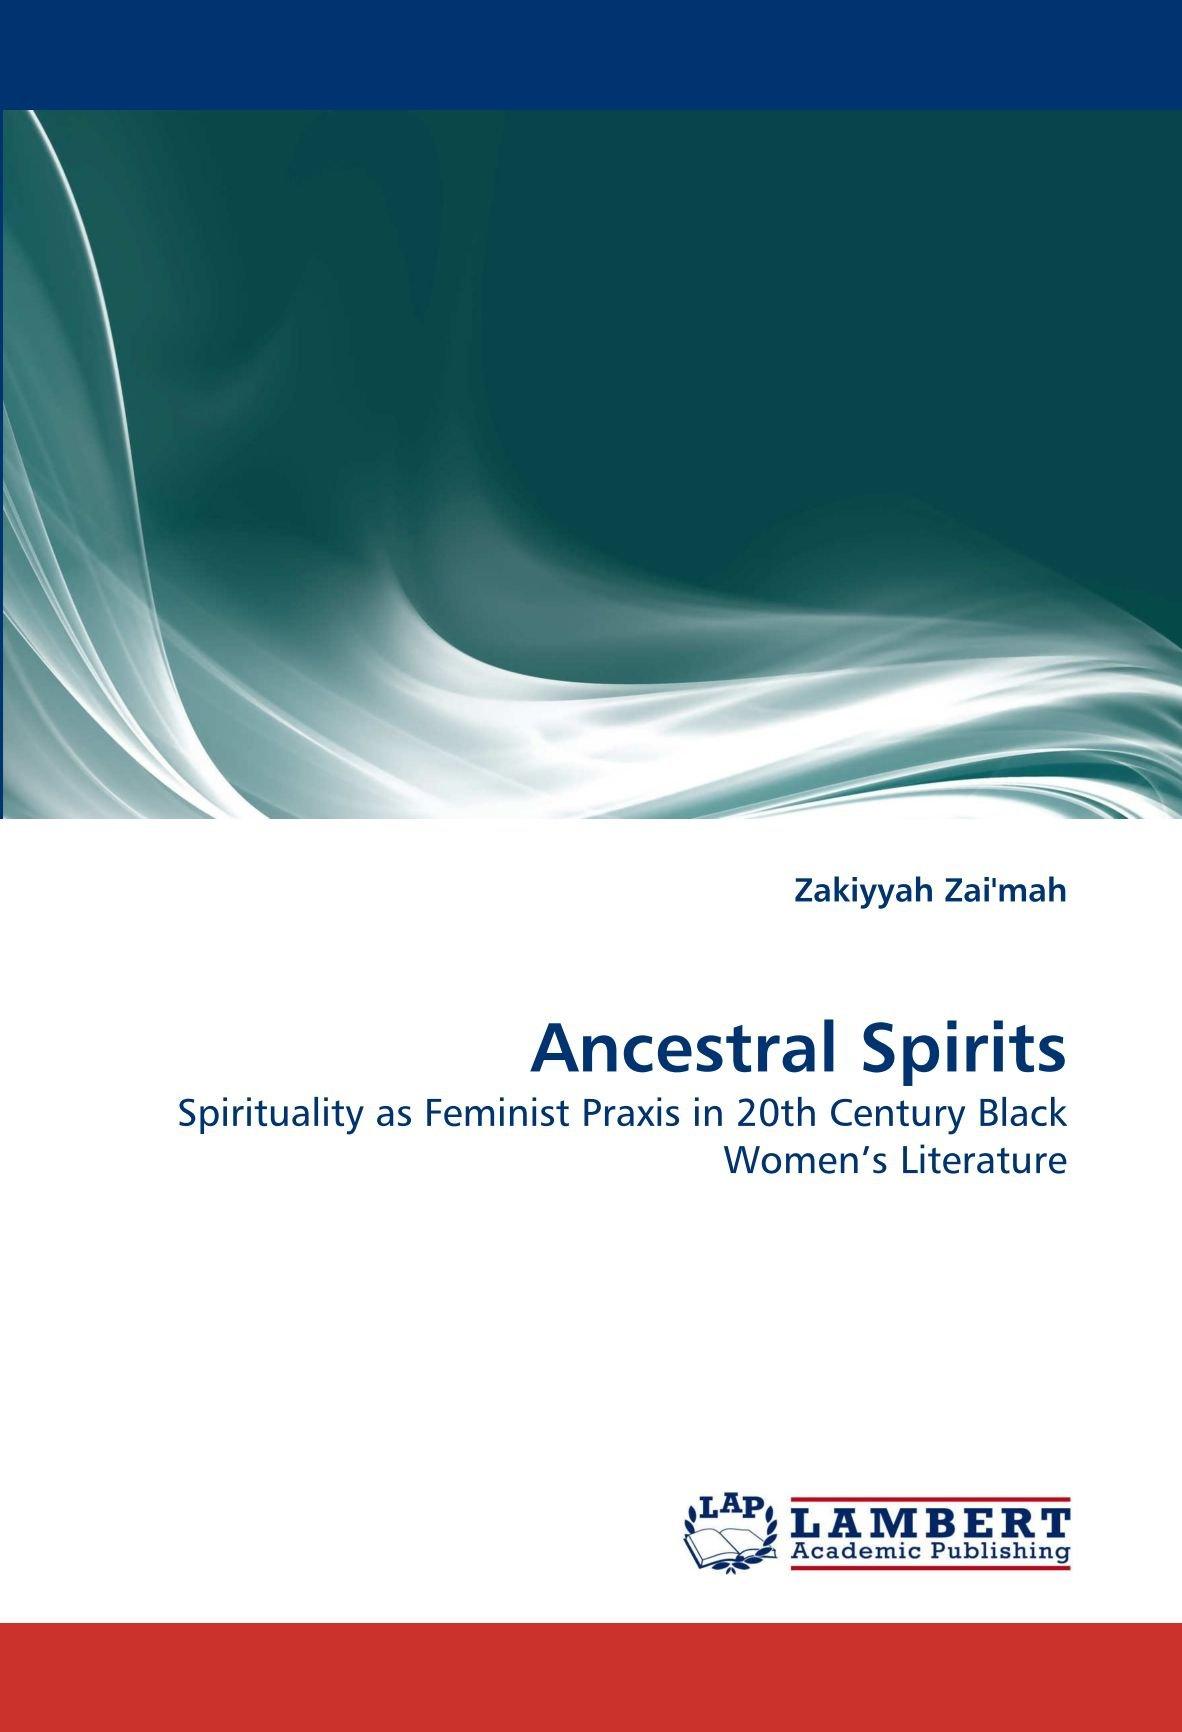 Download Ancestral Spirits: Spirituality as Feminist Praxis in 20th Century Black Women's Literature ebook